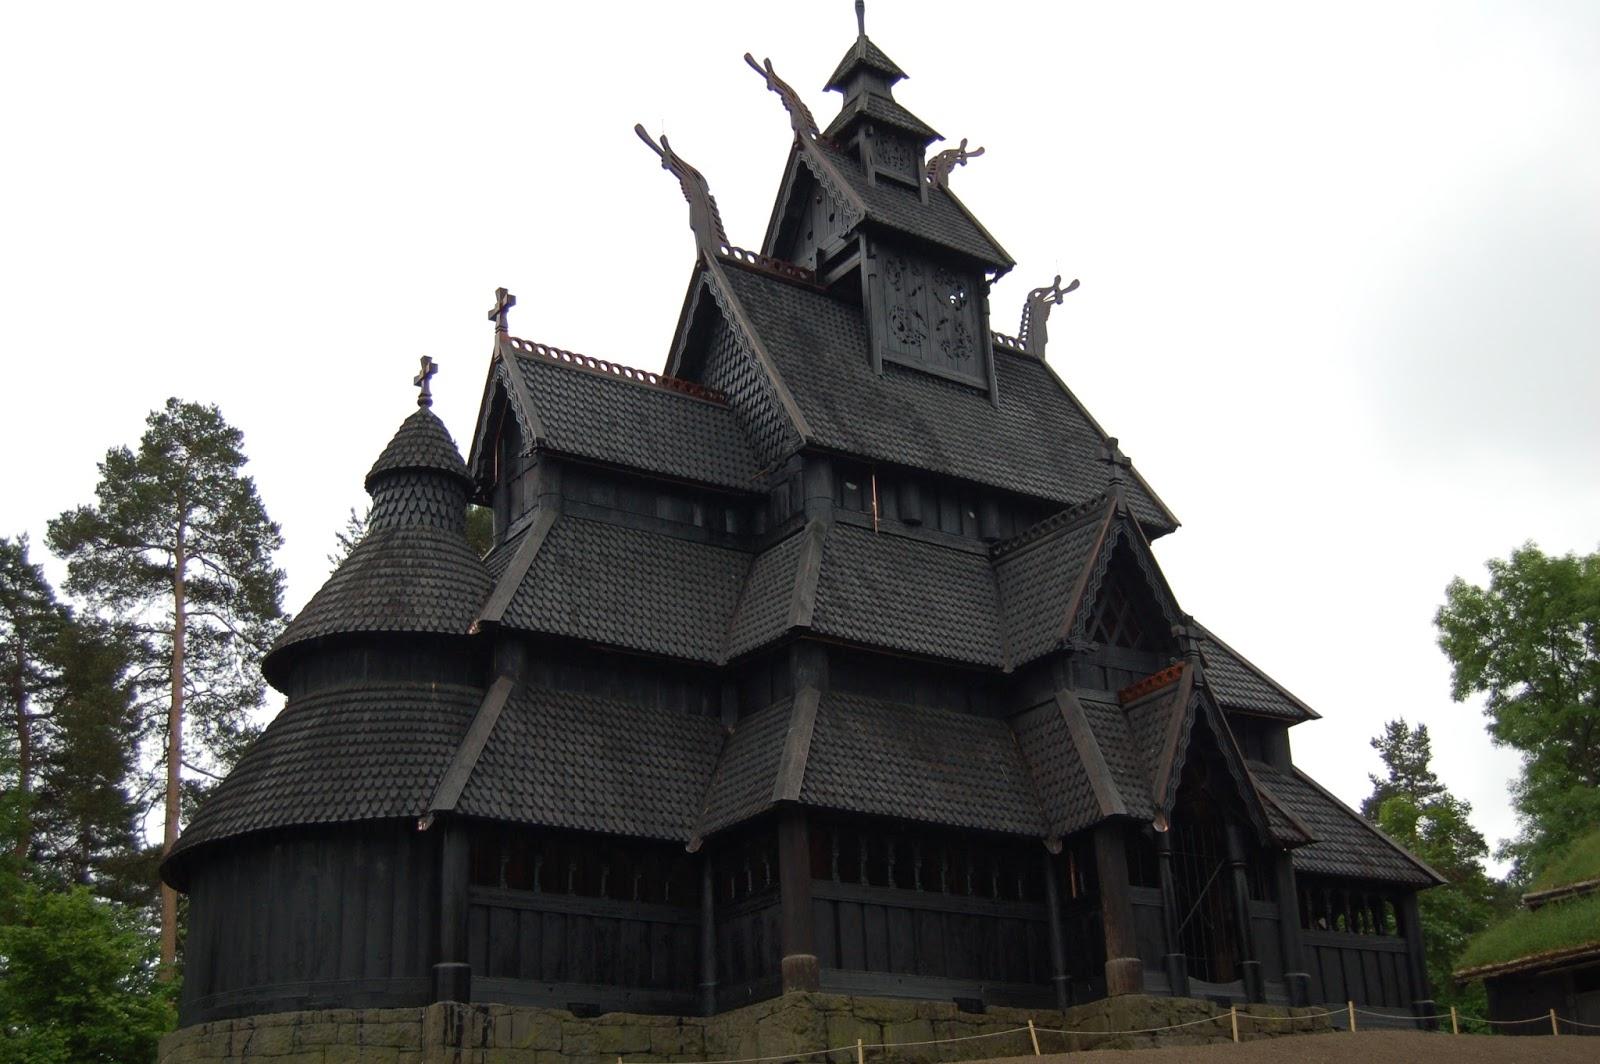 Stavkirken, kościół klepkowy, skansen w Oslo, architektura norweska